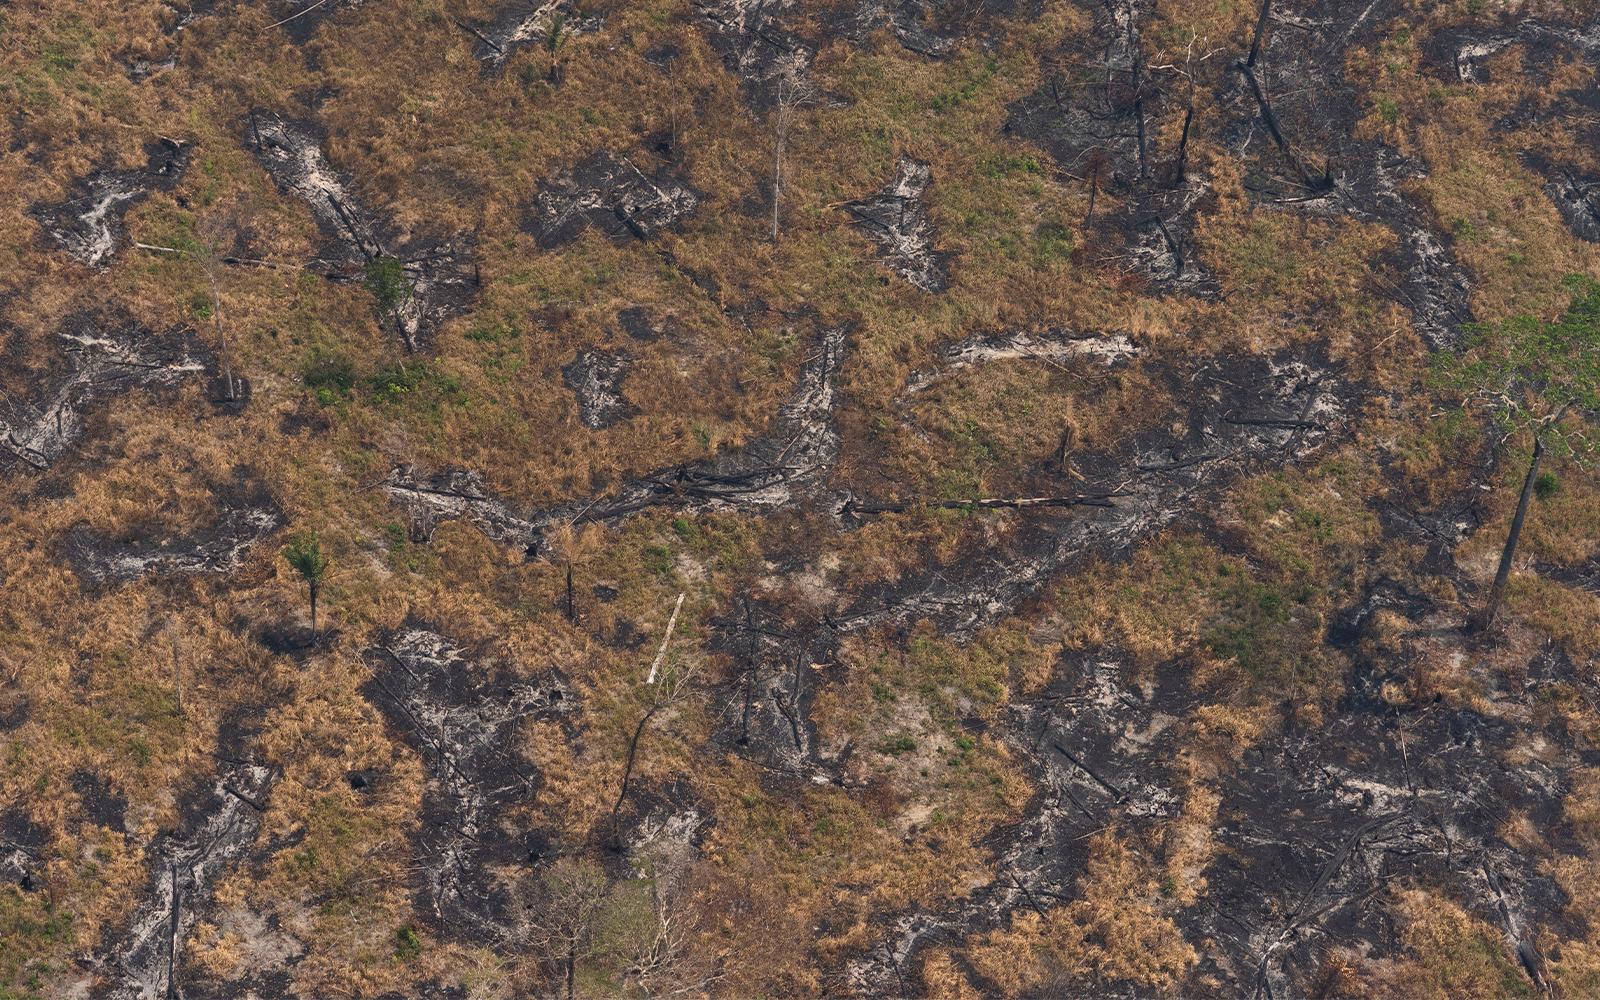 Charred trees felled by wildfires are seen near Porto Velho, Brazil, Aug. 23, 2019. (AP Photo/Victor R. Caivano)